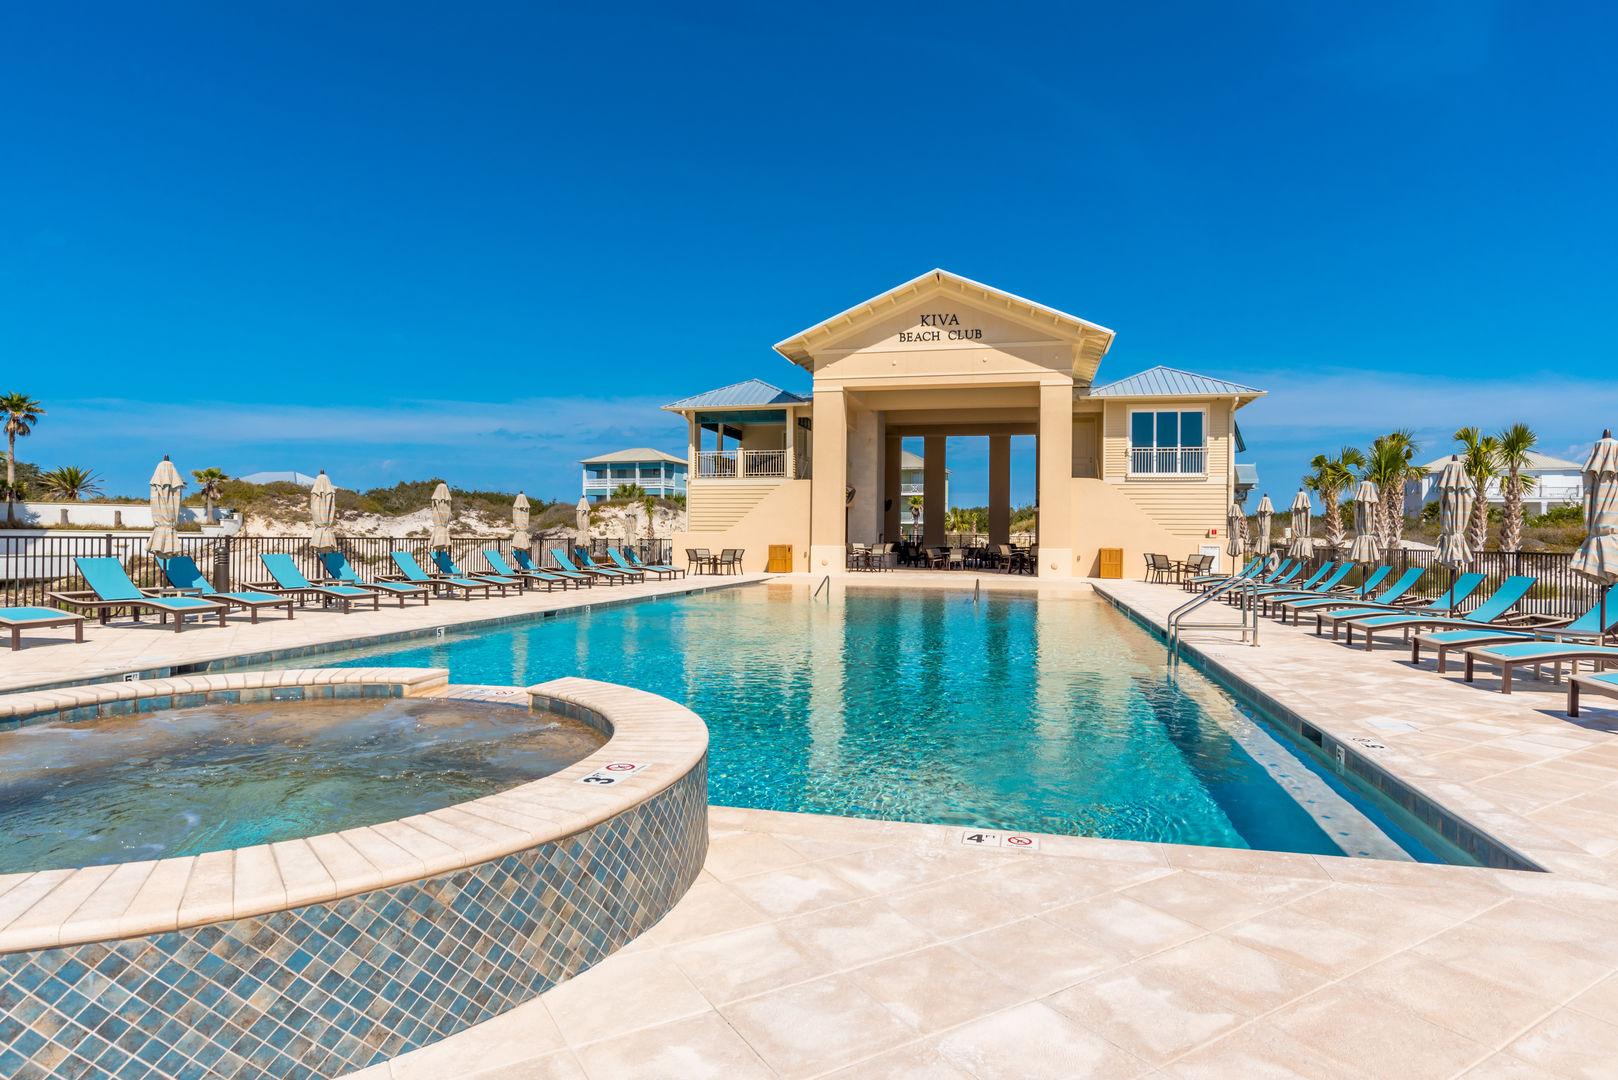 Enjoy Kiva Dunes' amenities